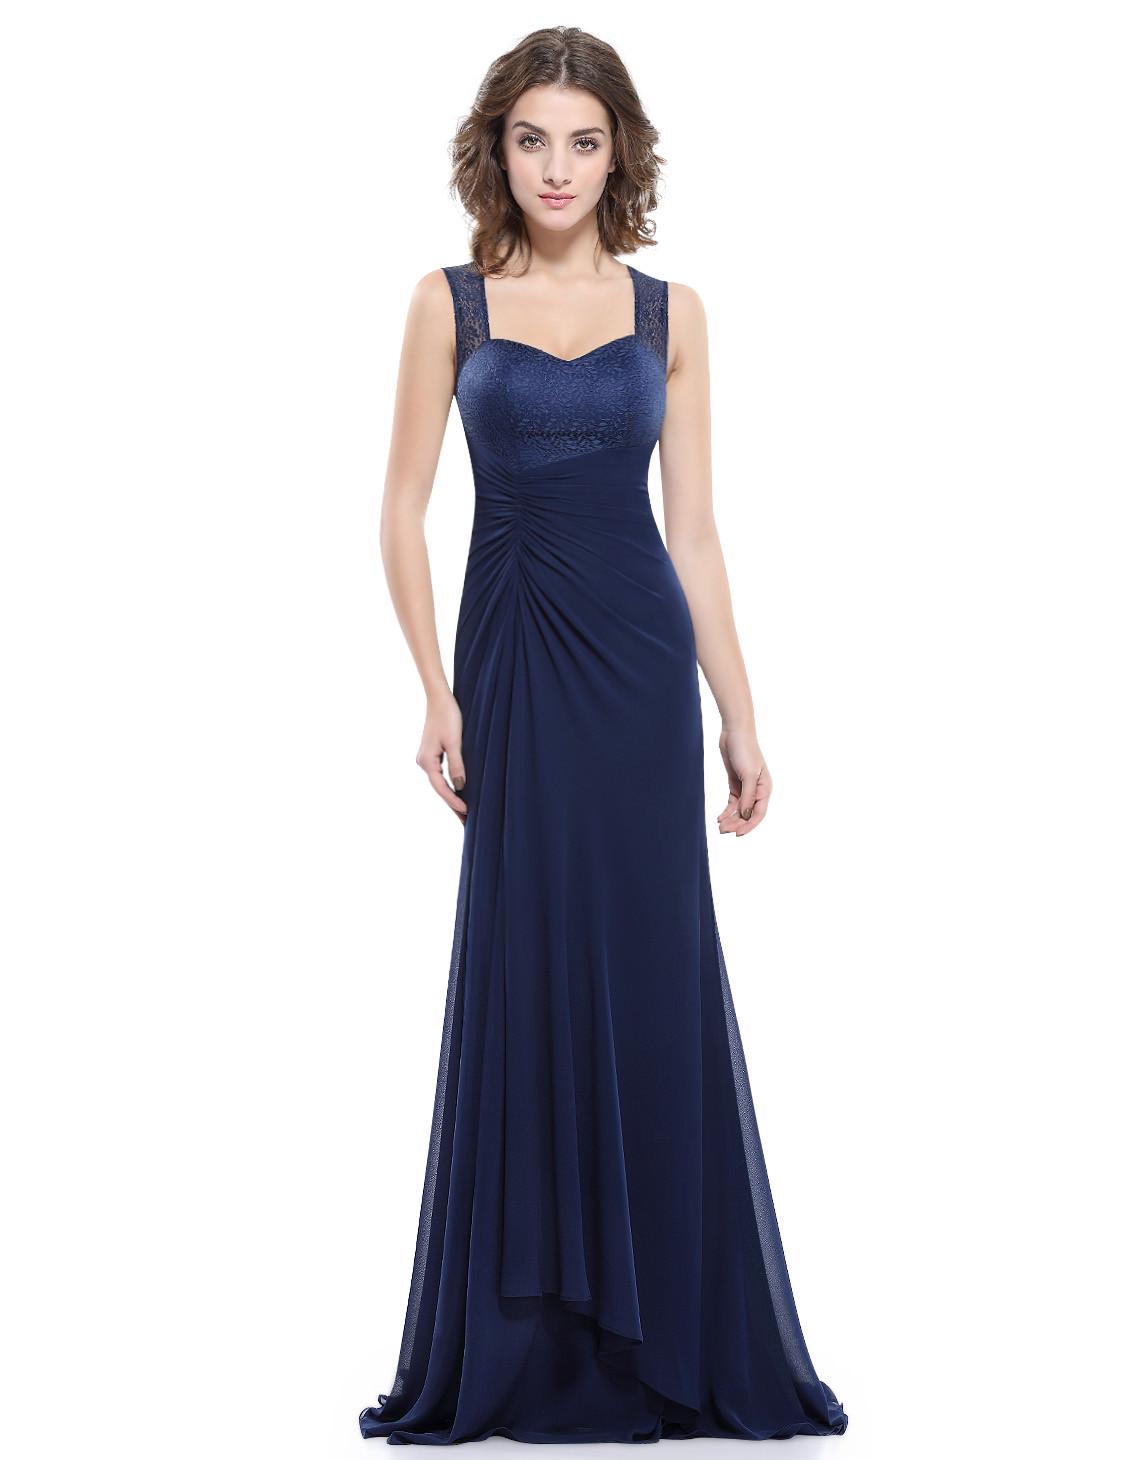 Stunning Navy Lace Back bridesmaid dress